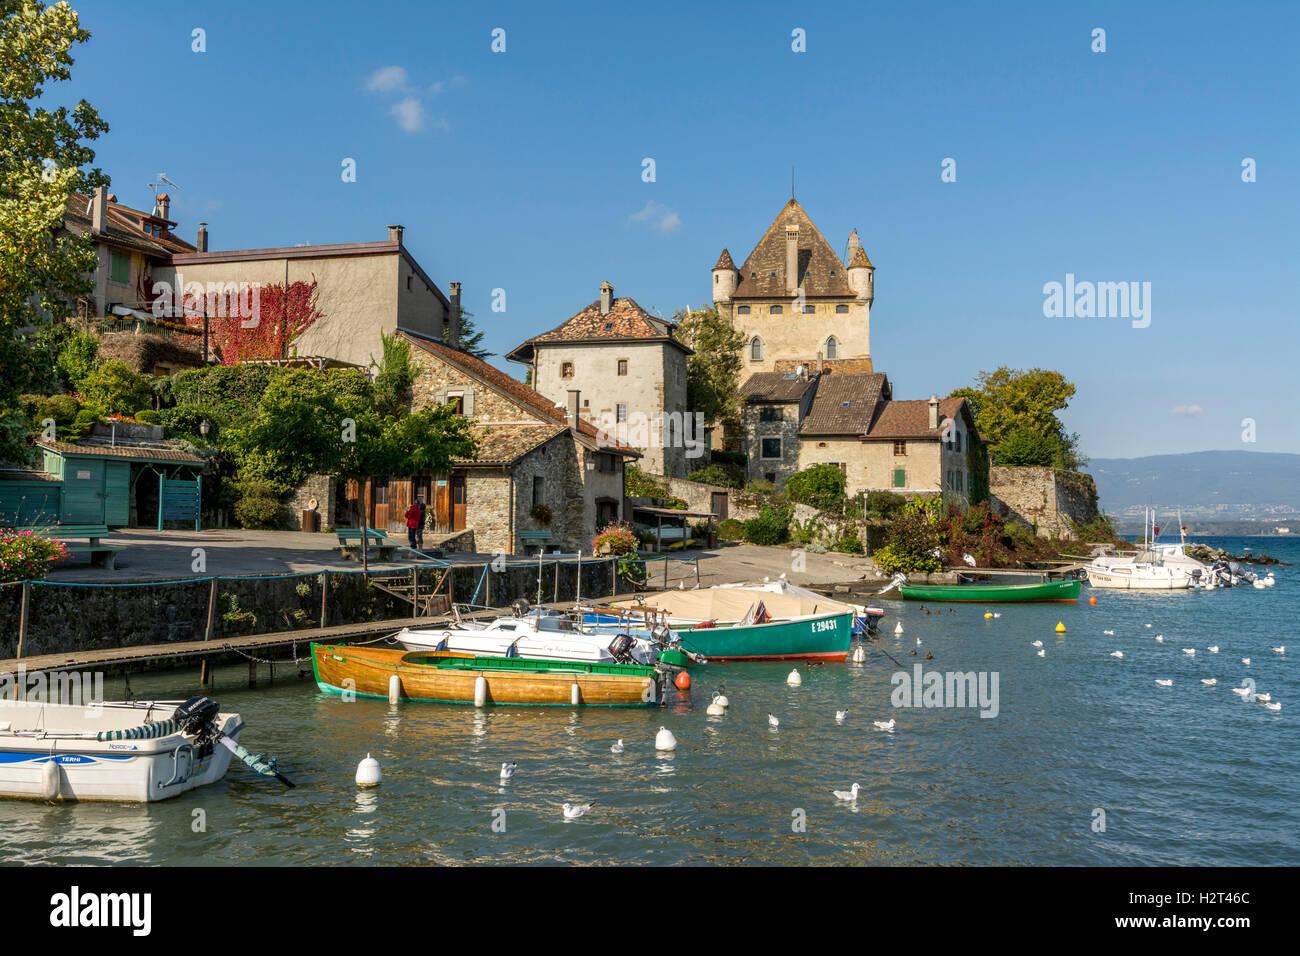 Old port on Lac Leman, Lake Geneva, Yvoire, Rhone-Alpes, Haute-Savoie, France - Stock Image